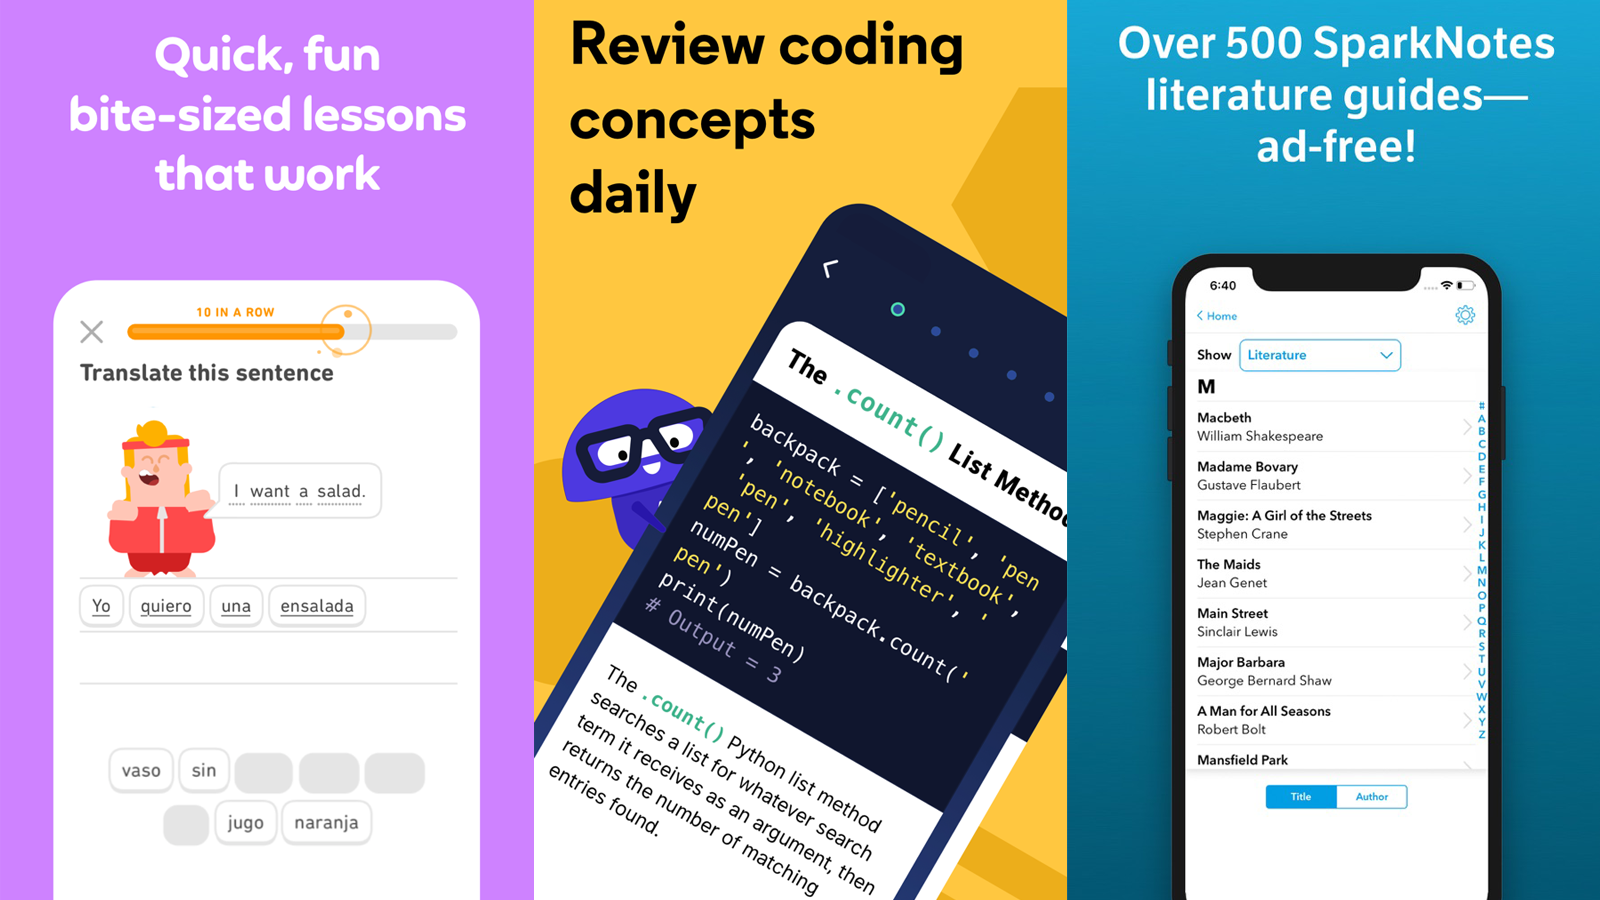 Duolingo, Codecademy, SparkNotes